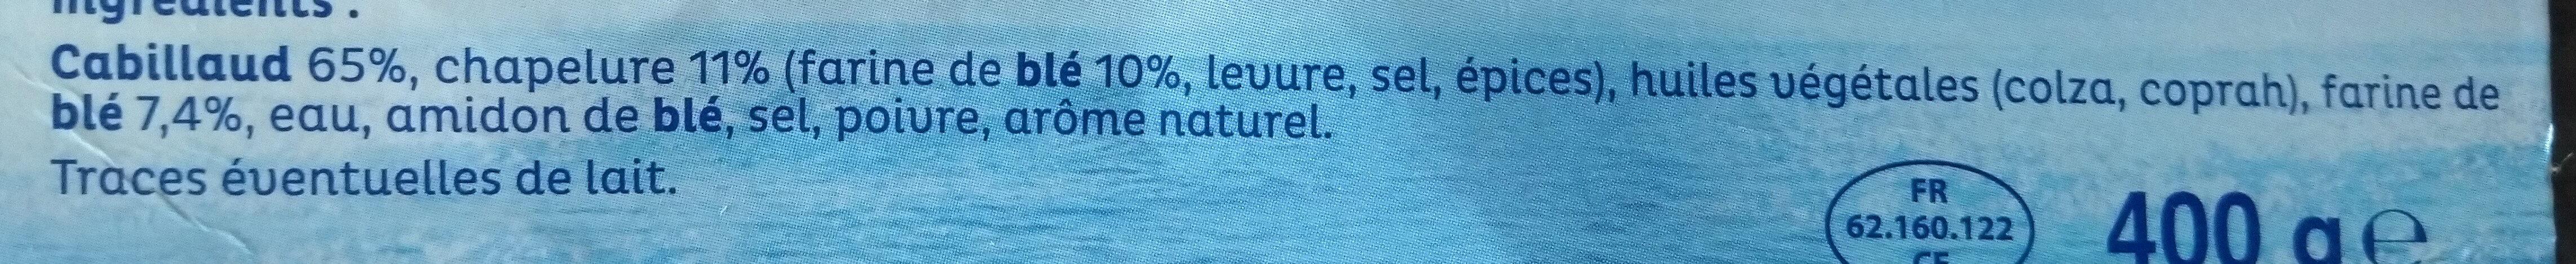 4 filets Cabillaud - Ingrédients - fr